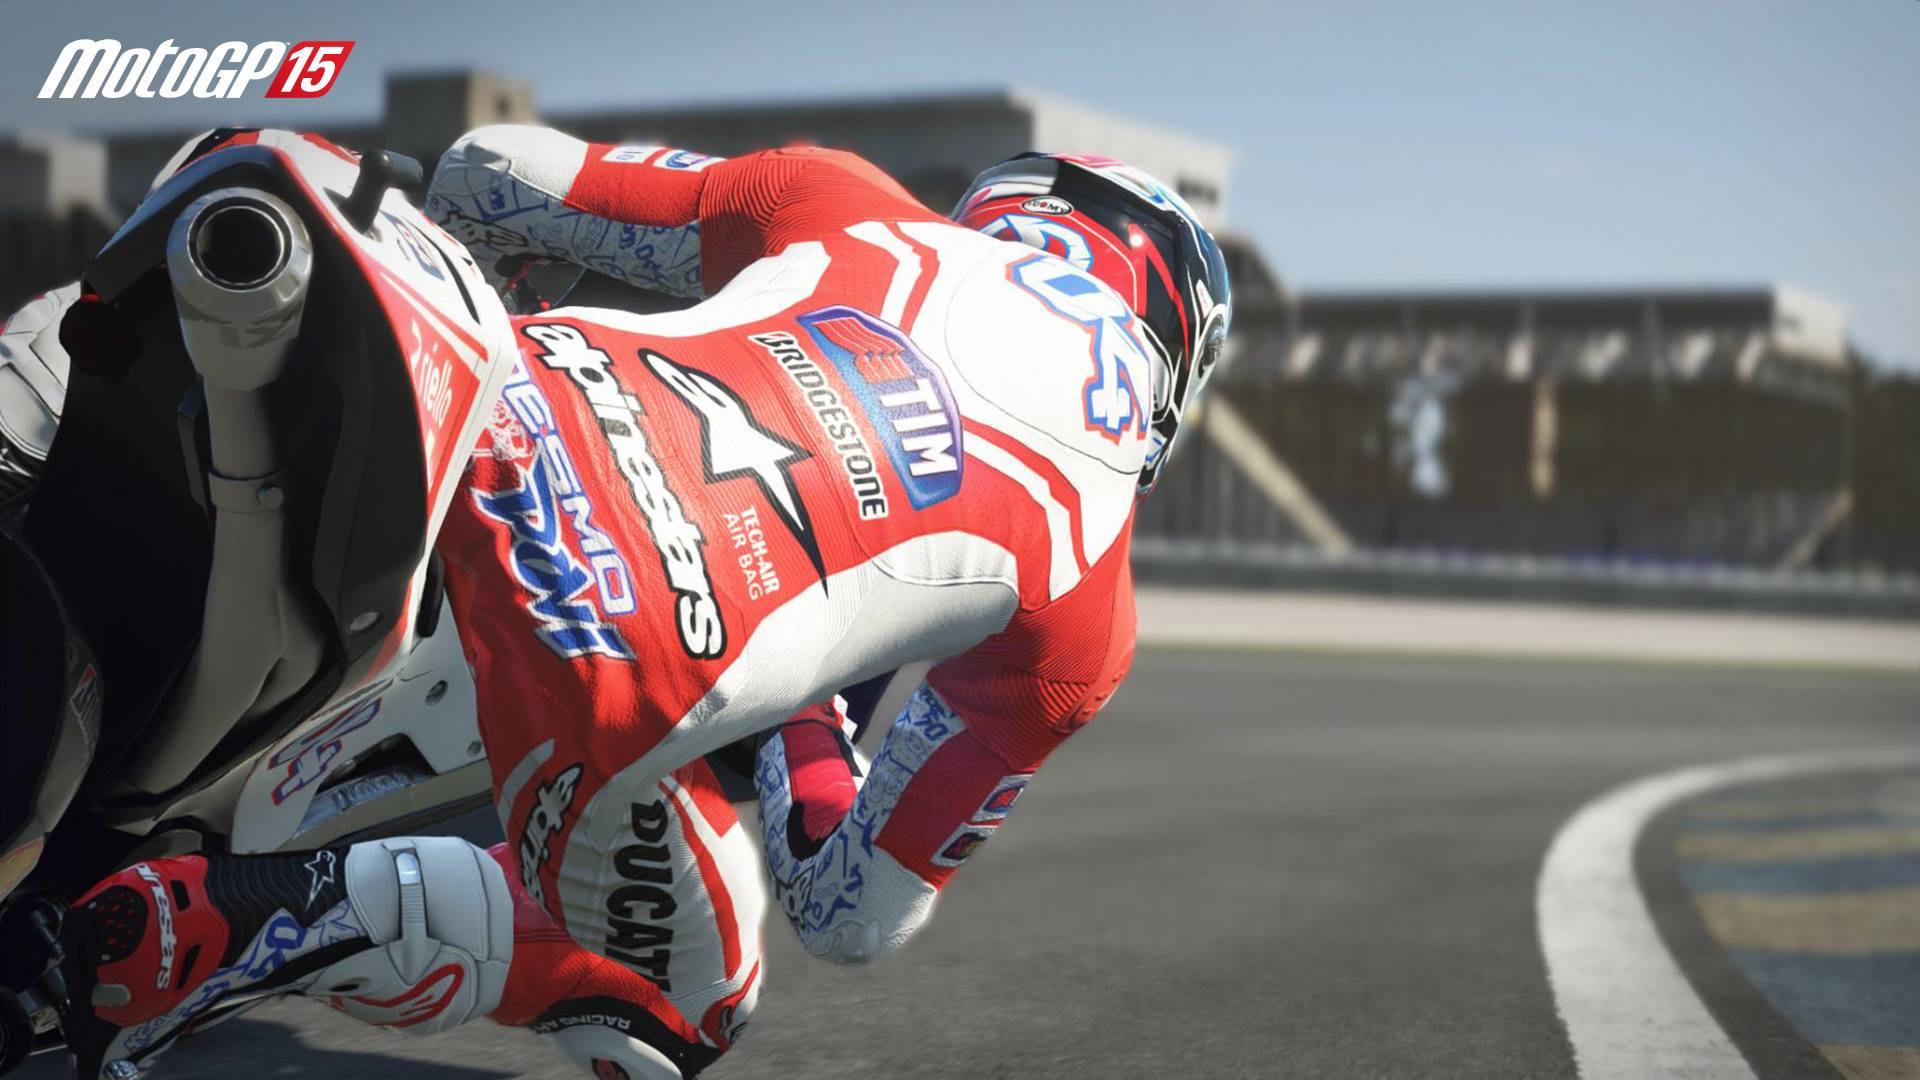 Moto GP 2015 review